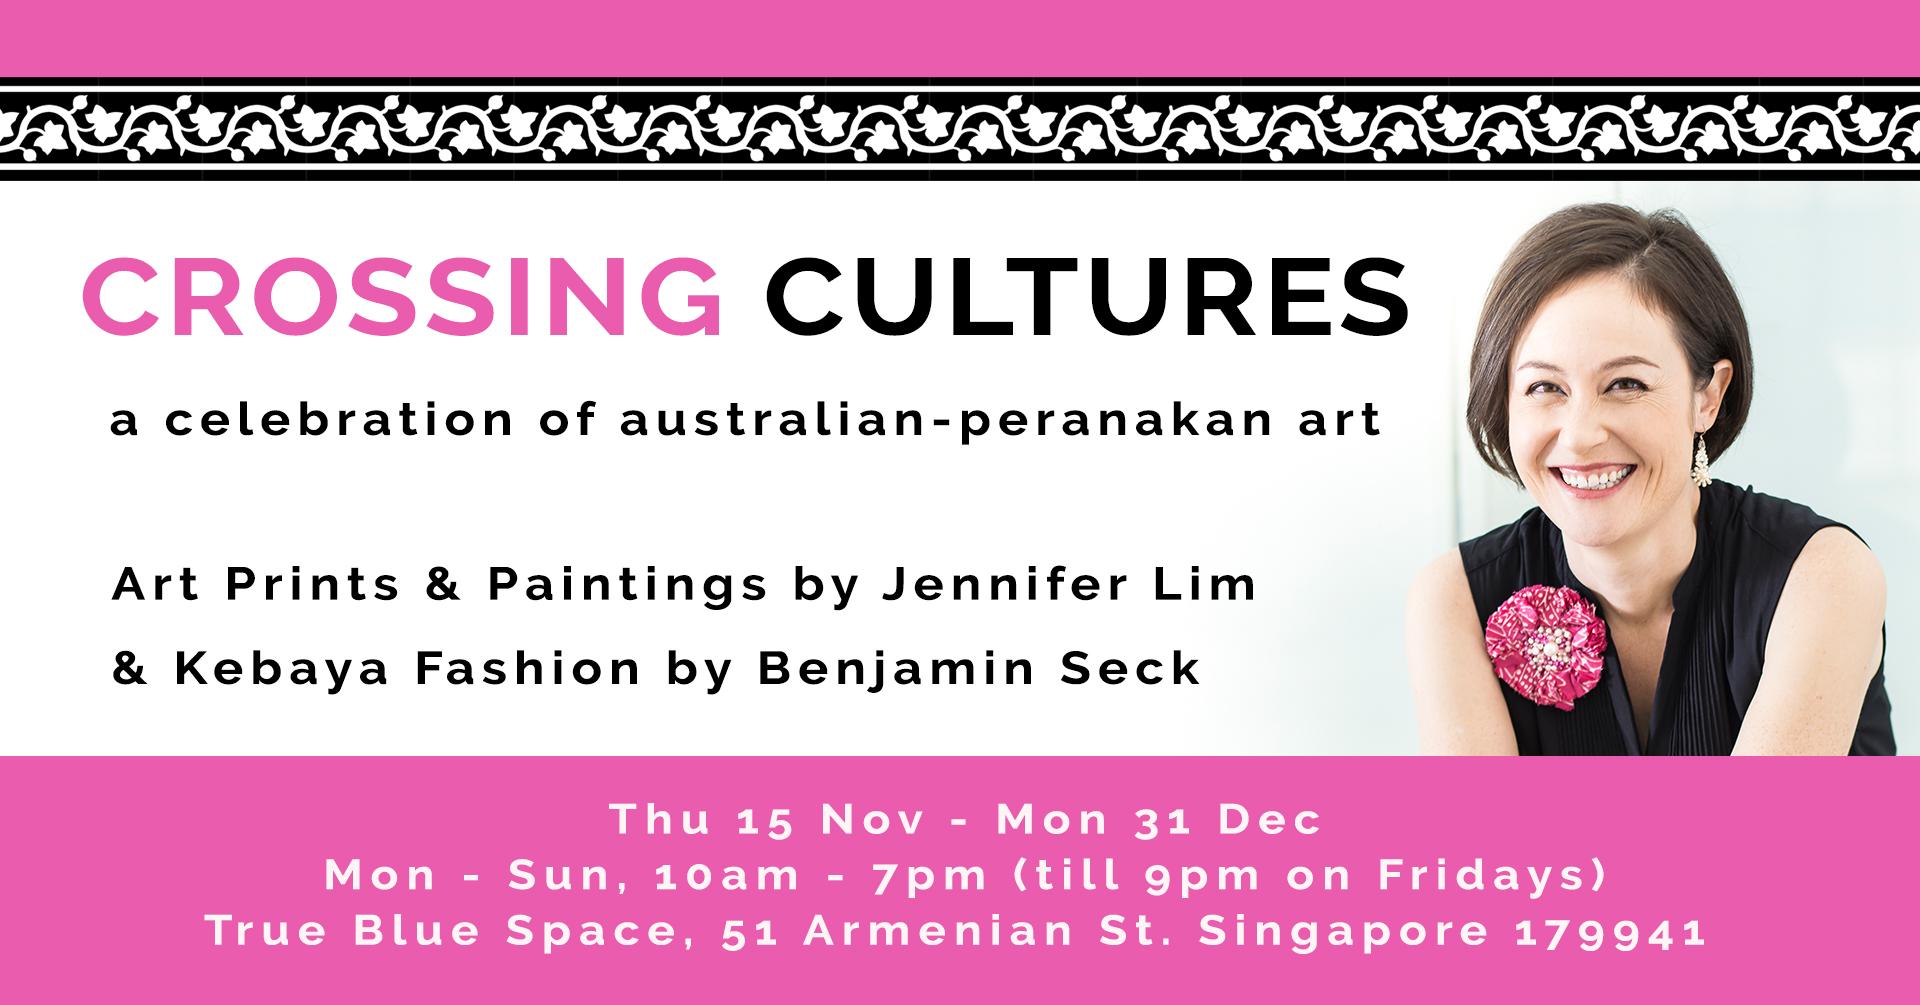 Jennifer-lim-fb-event-banner-general-new.jpg